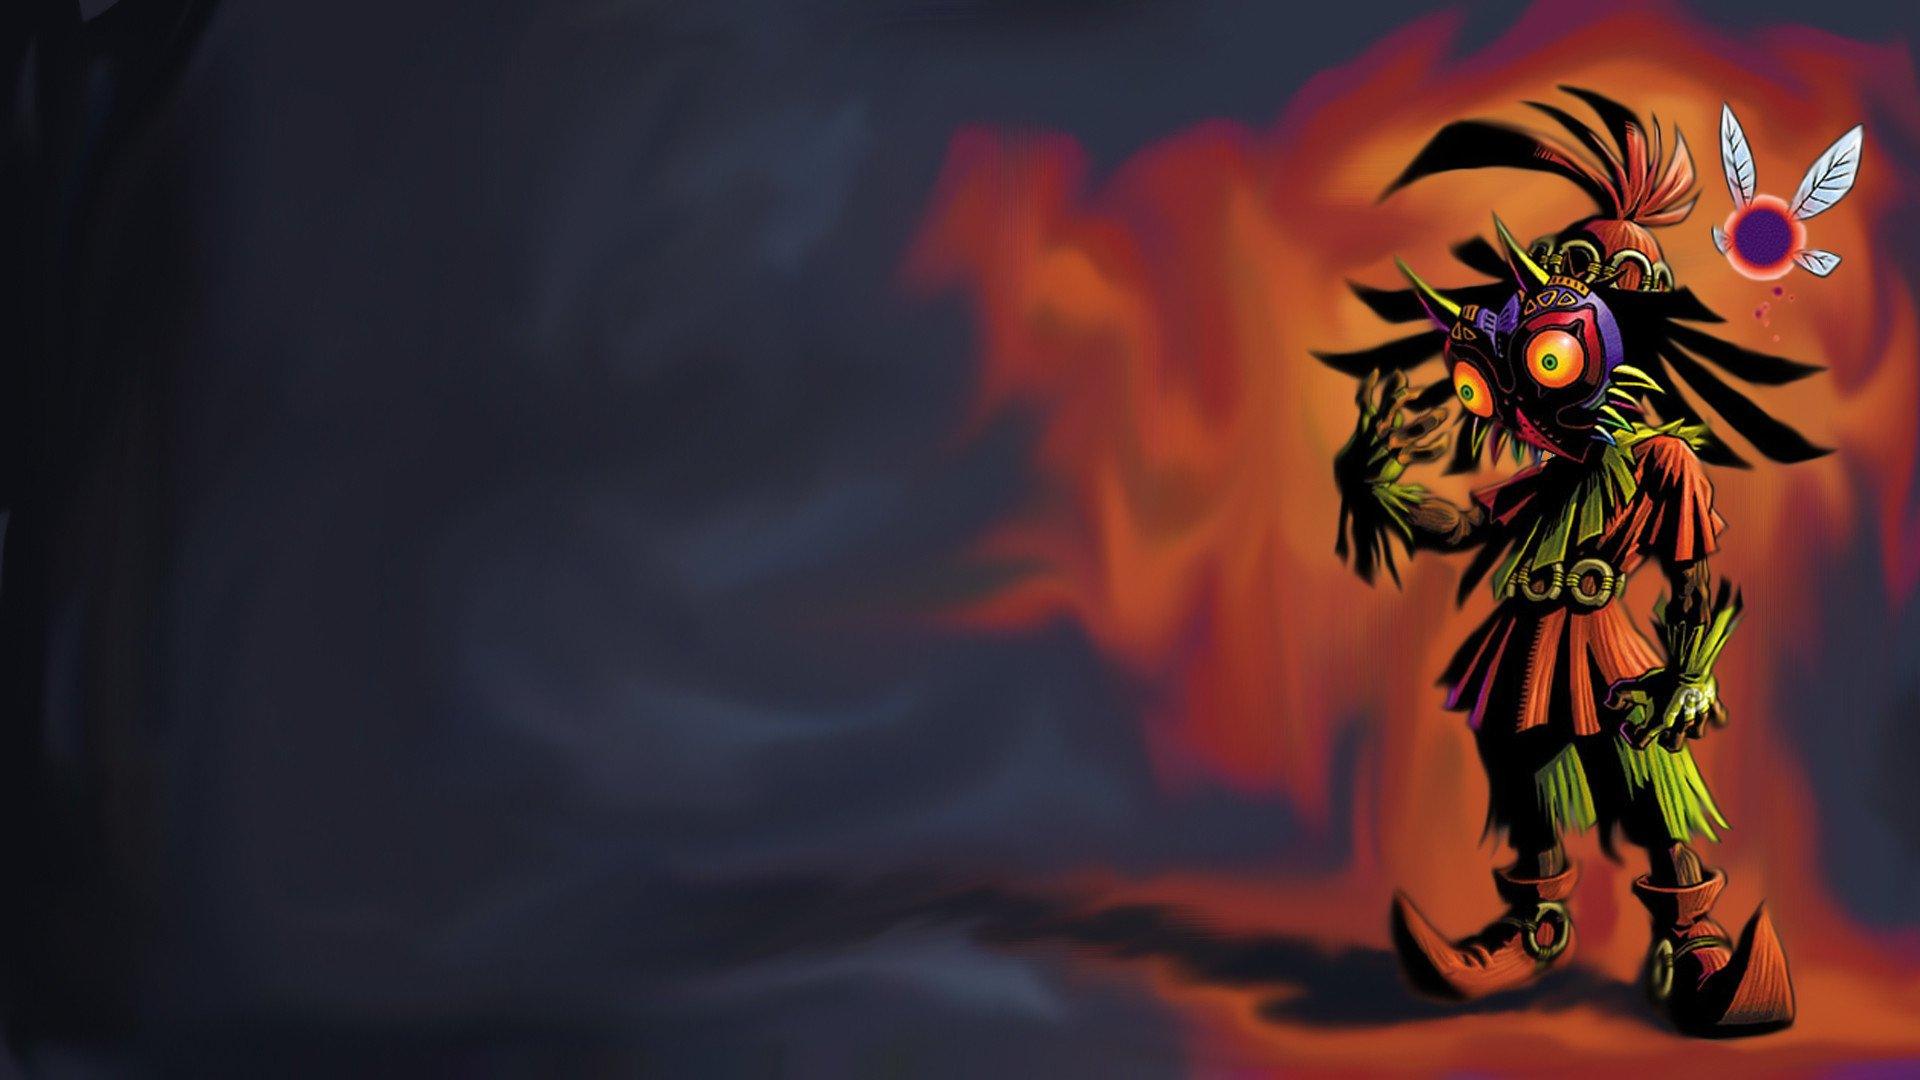 The Legend Of Zelda Majora S Mask Hd Wallpaper Background Image 1920x1080 Id 531827 Wallpaper Abyss